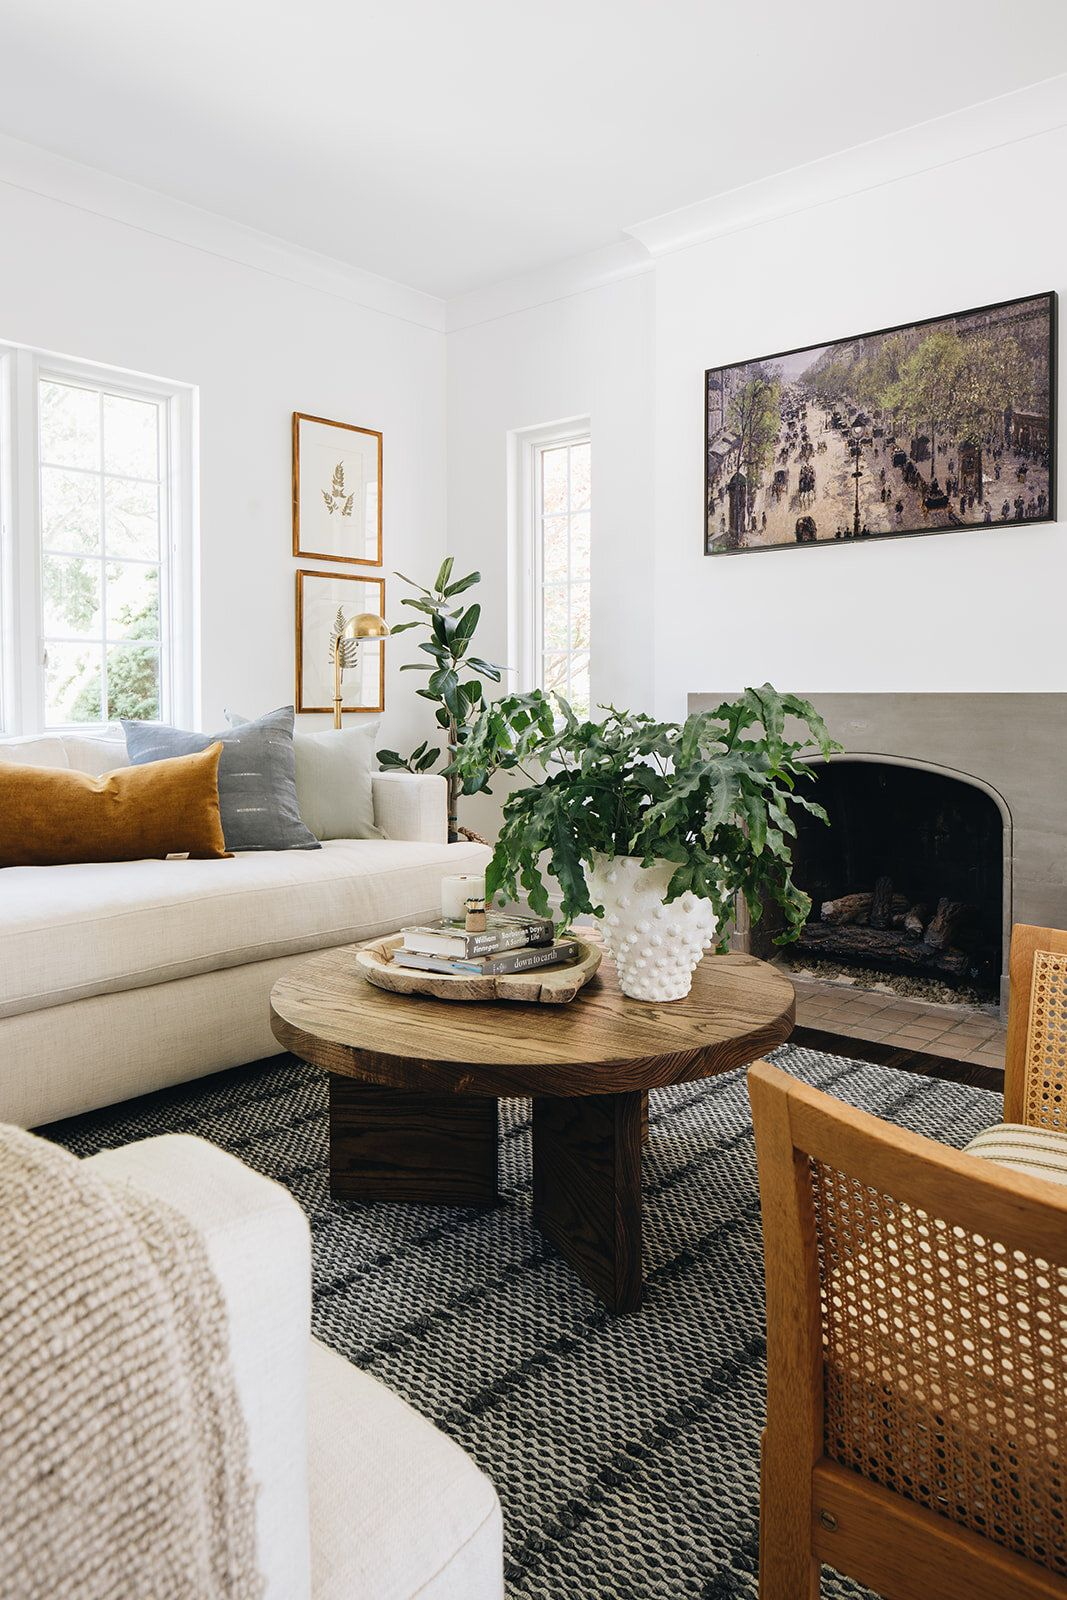 Jsd July 2020 031 Jpg In 2020 Living Room Decor Interior Design House Interior